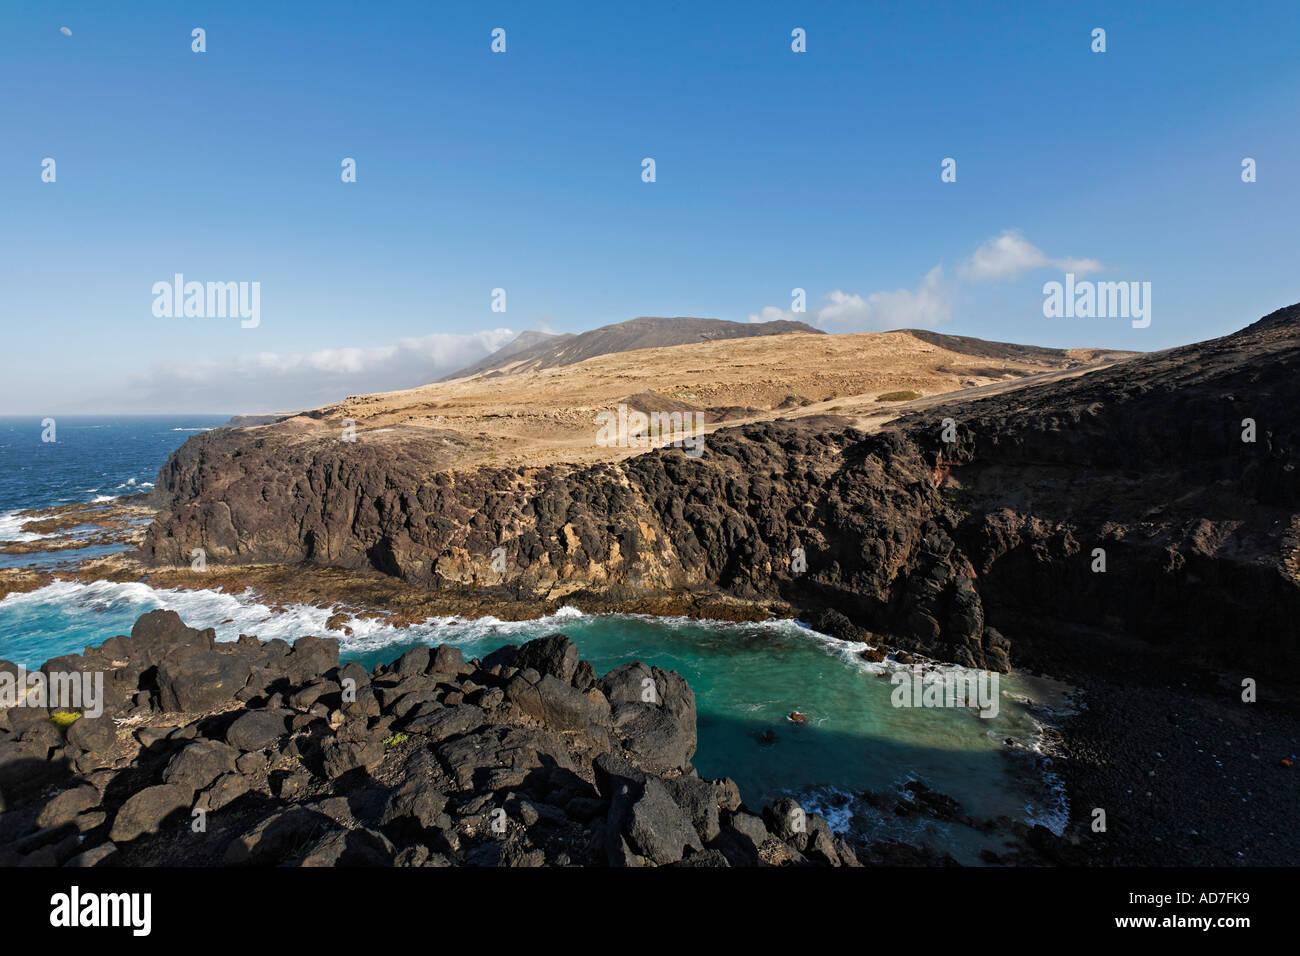 Punta del Rayo Jandia Fuerteventura Canaries Photo Stock